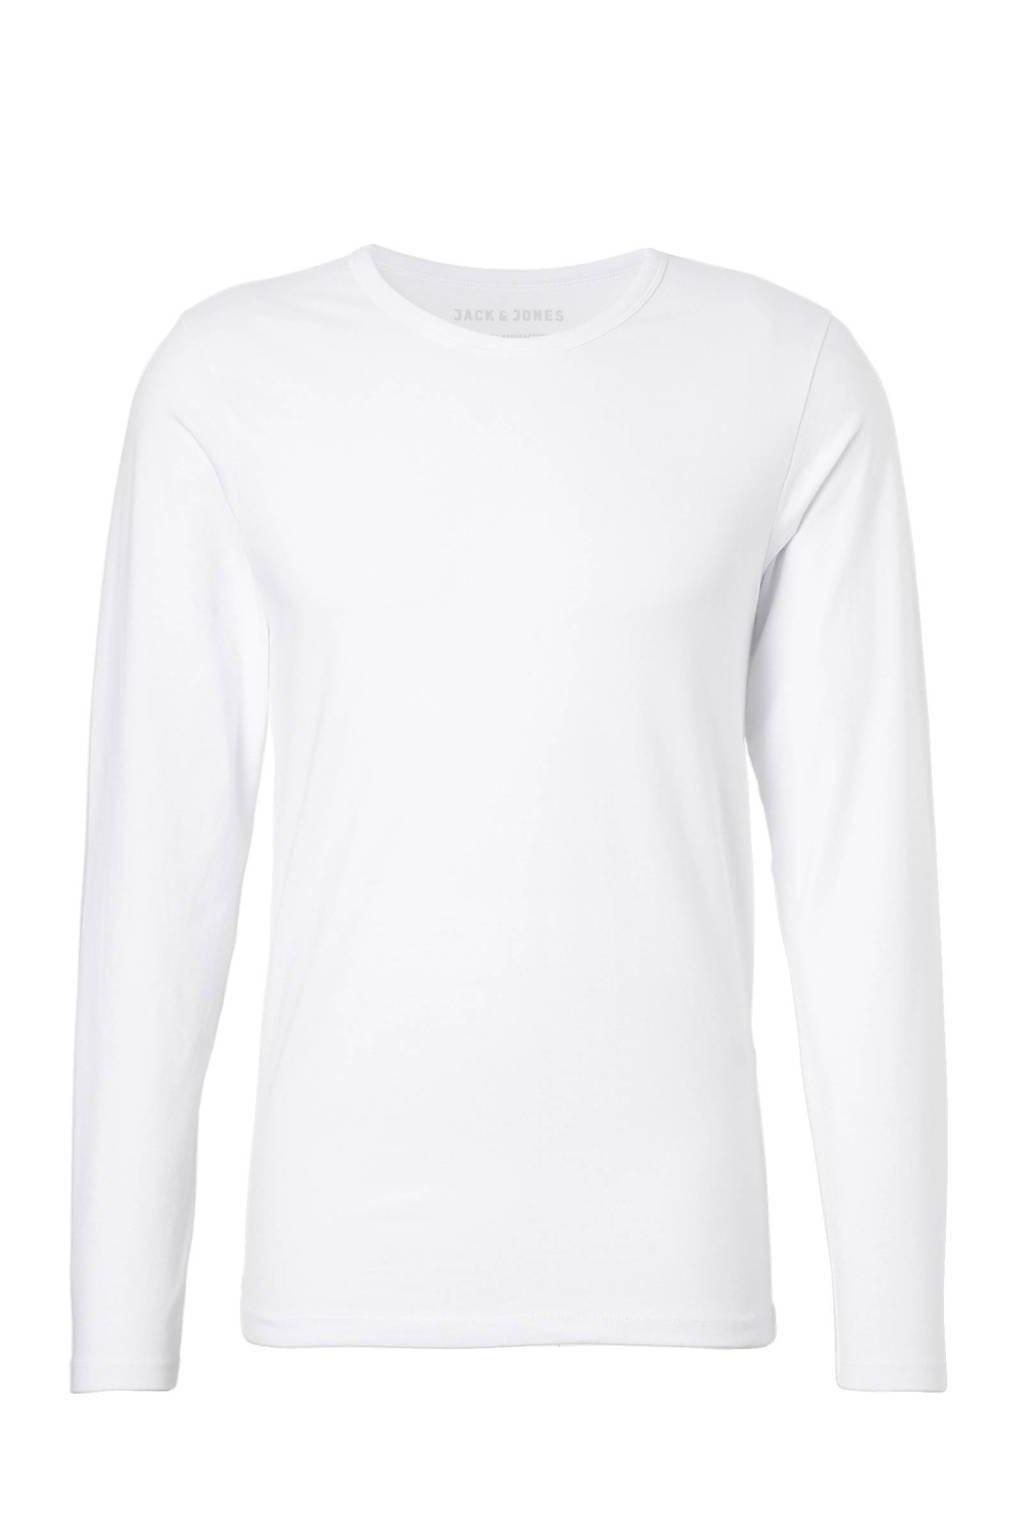 Jack & Jones T-shirt, Wit